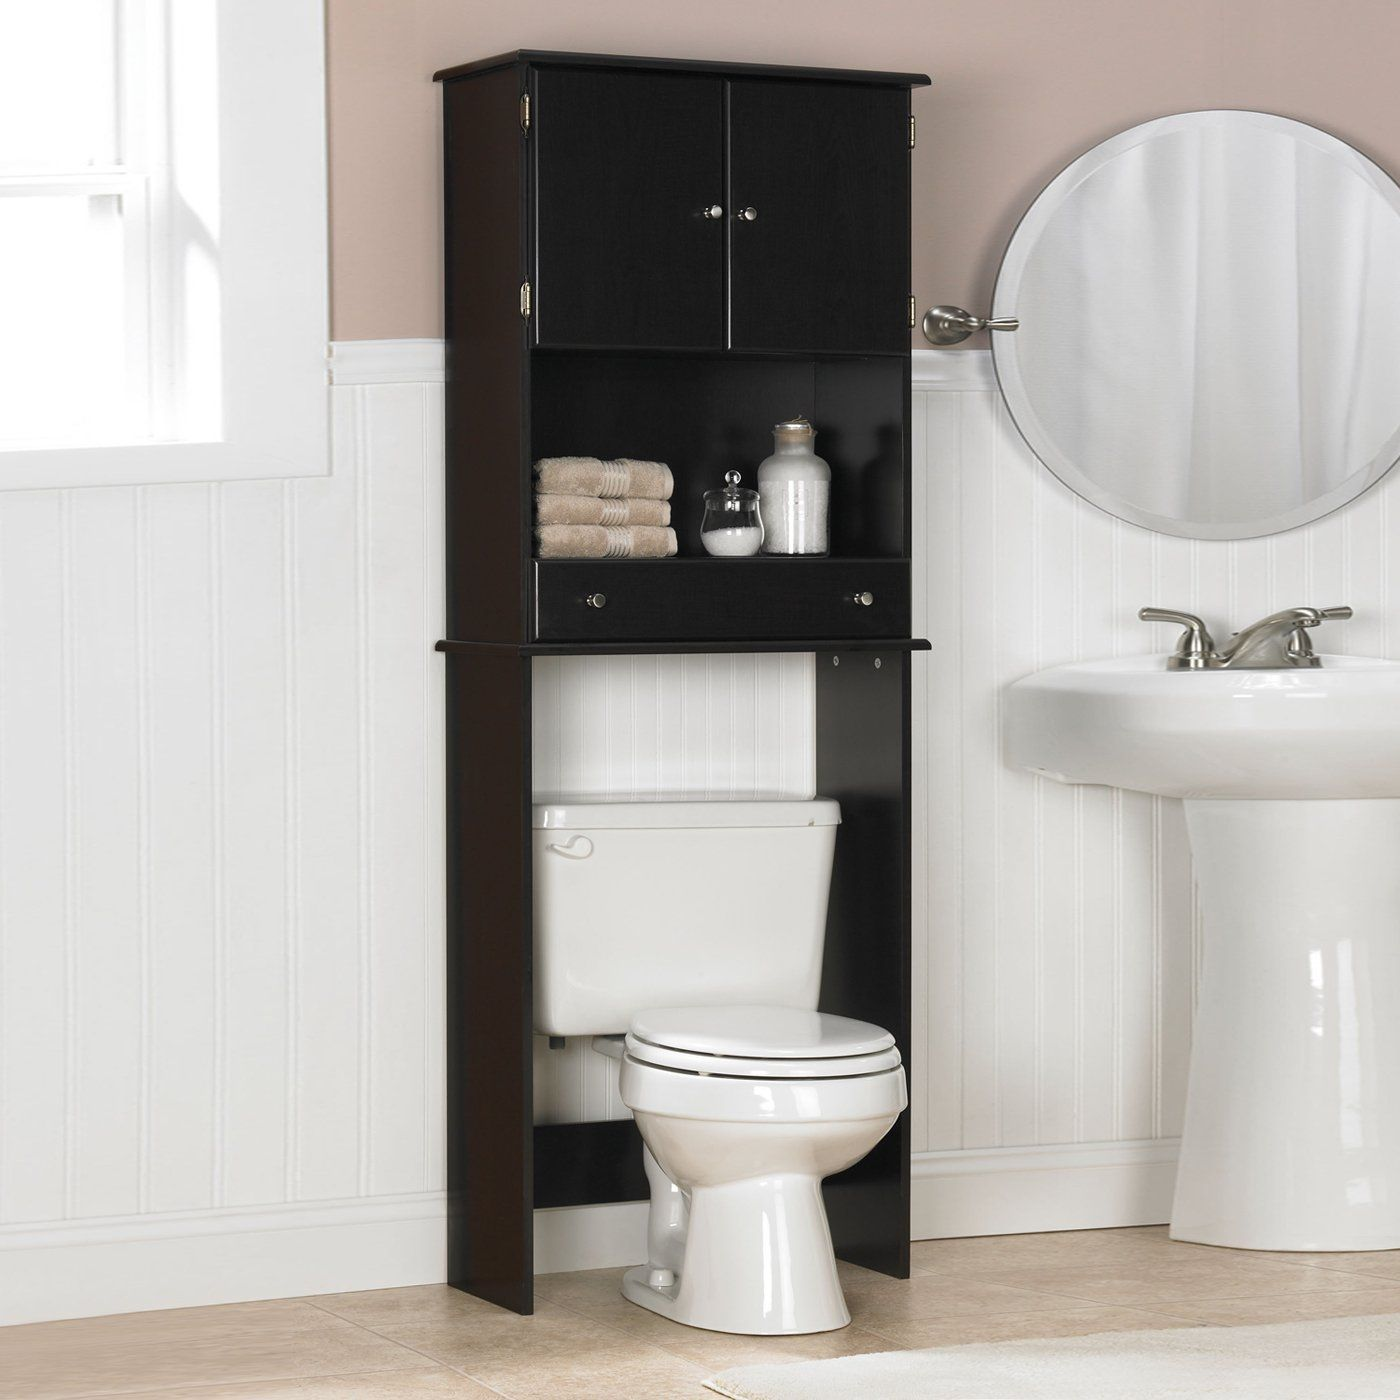 Over Commode Cabinet Home Furniture Showroom Black Cabinets Bathroom Bathroom Shelf Decor Bathroom Space Saver